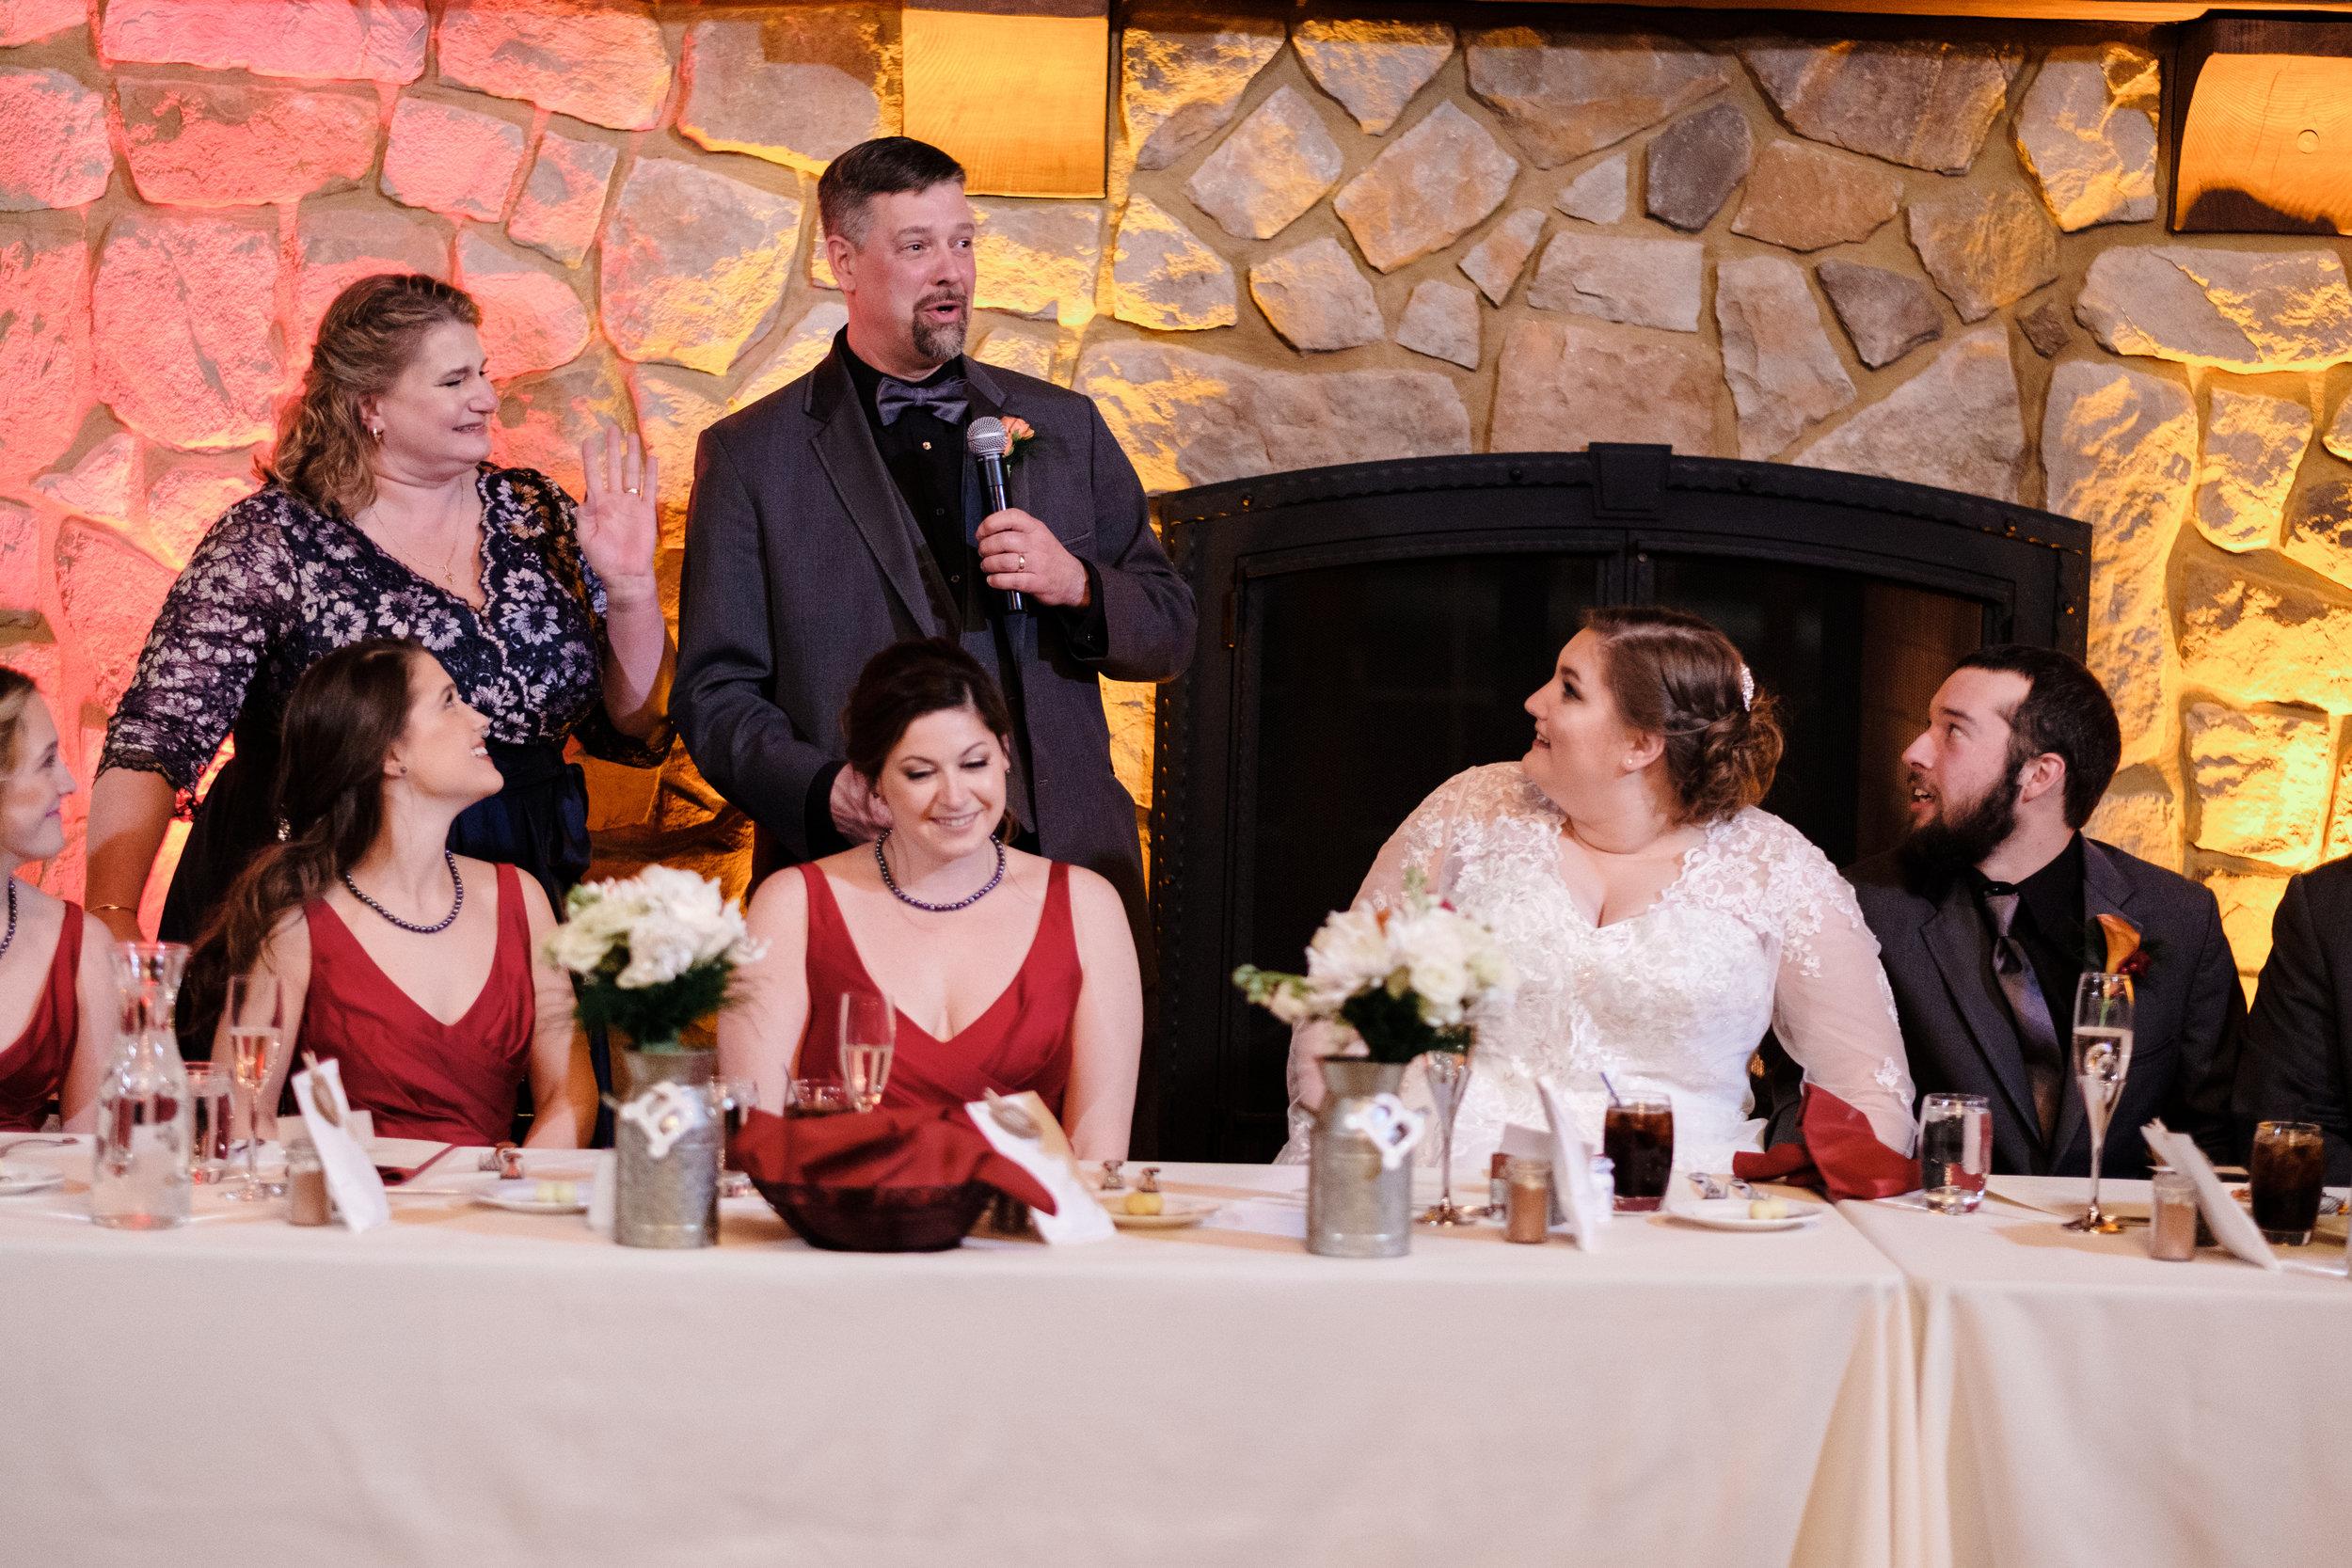 18-12-28 Corinne-Henry-Pavilion-Wedding-471.jpg